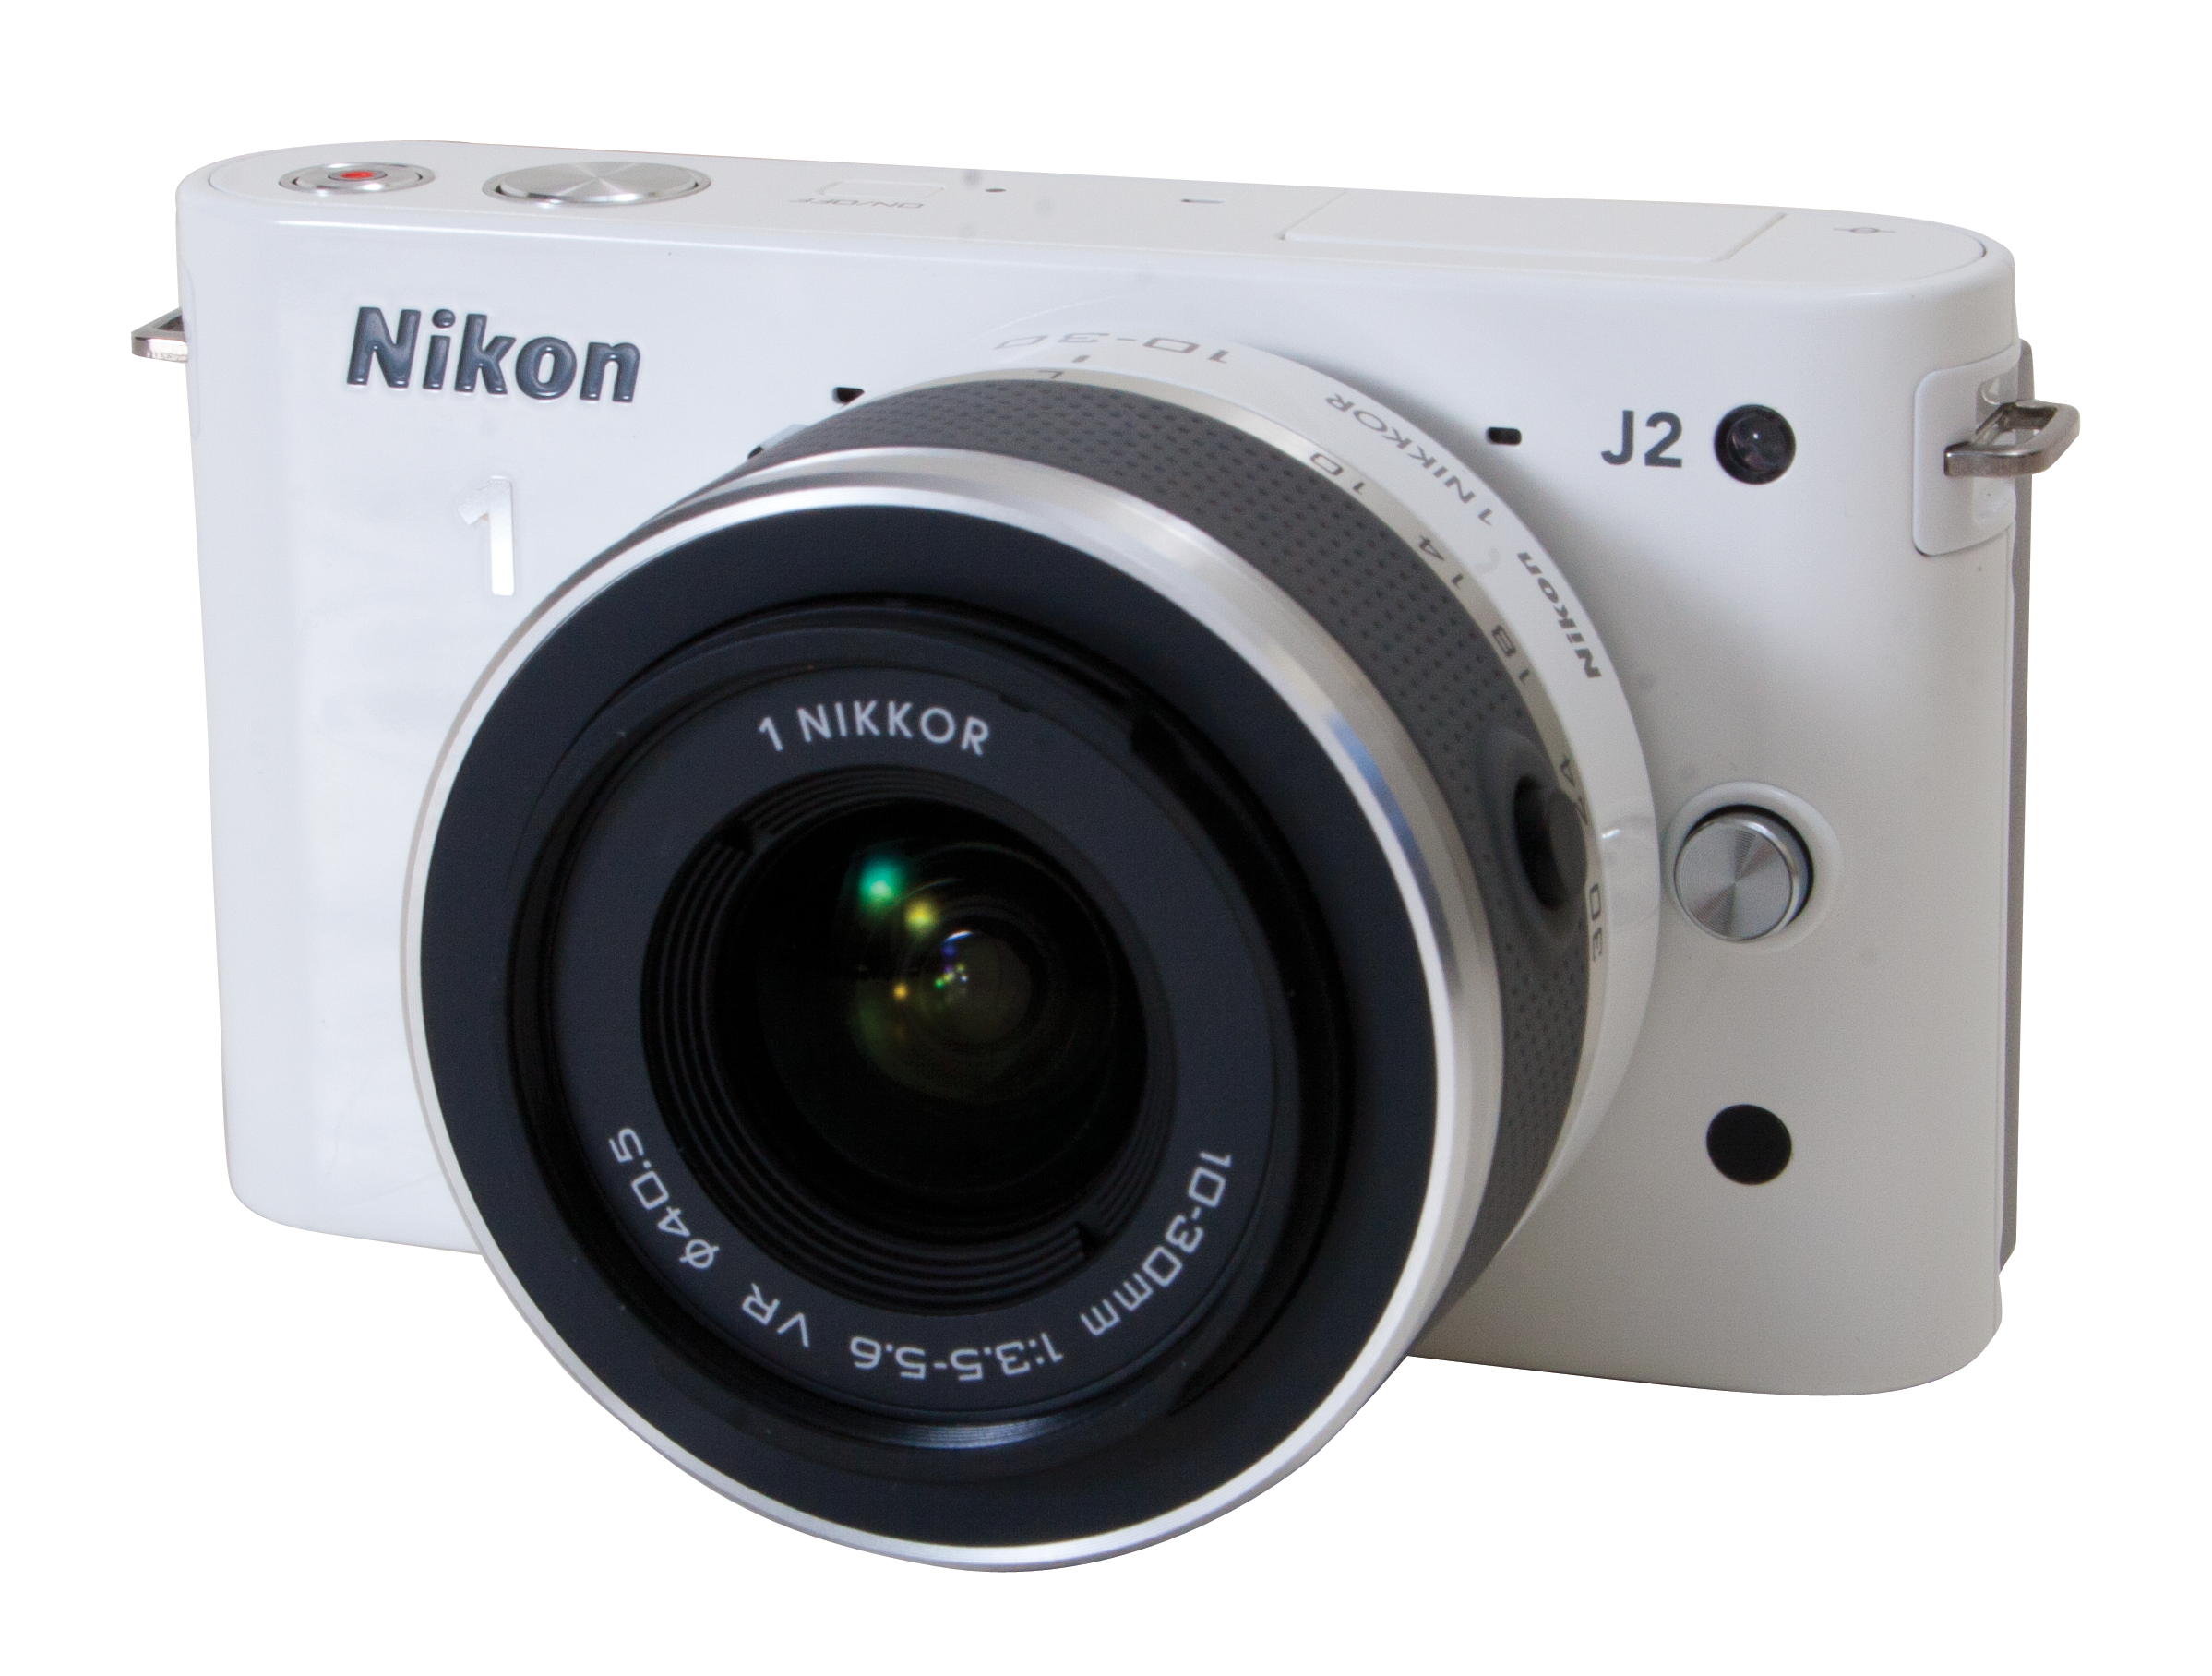 Nikon 1 J2 Compact Camera Review